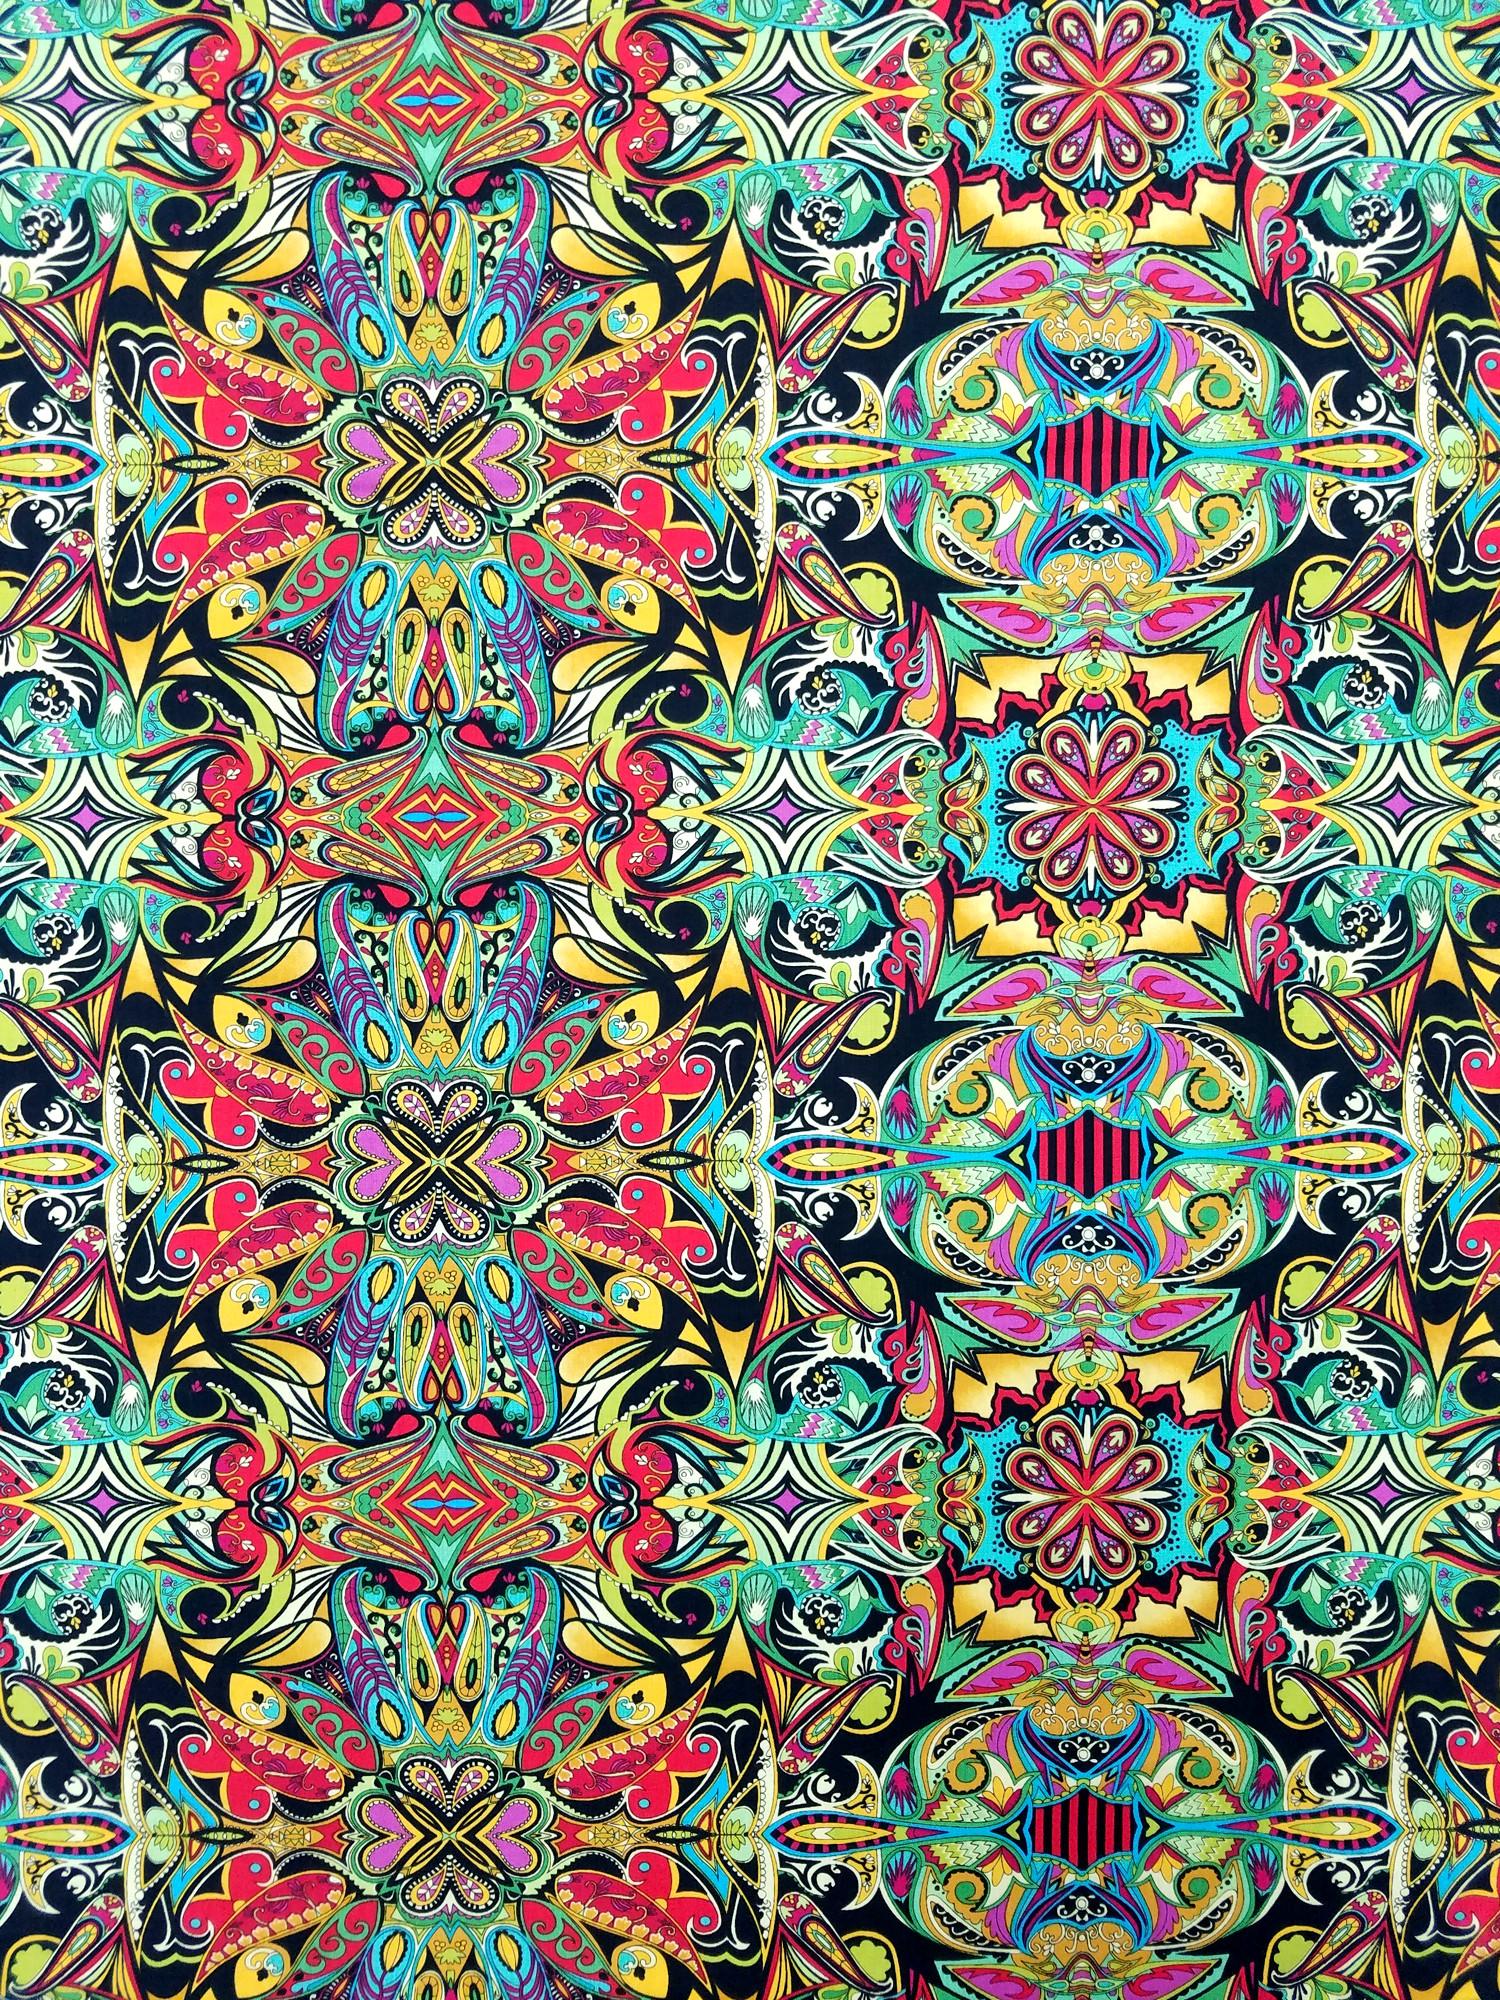 fabric 15.jpg